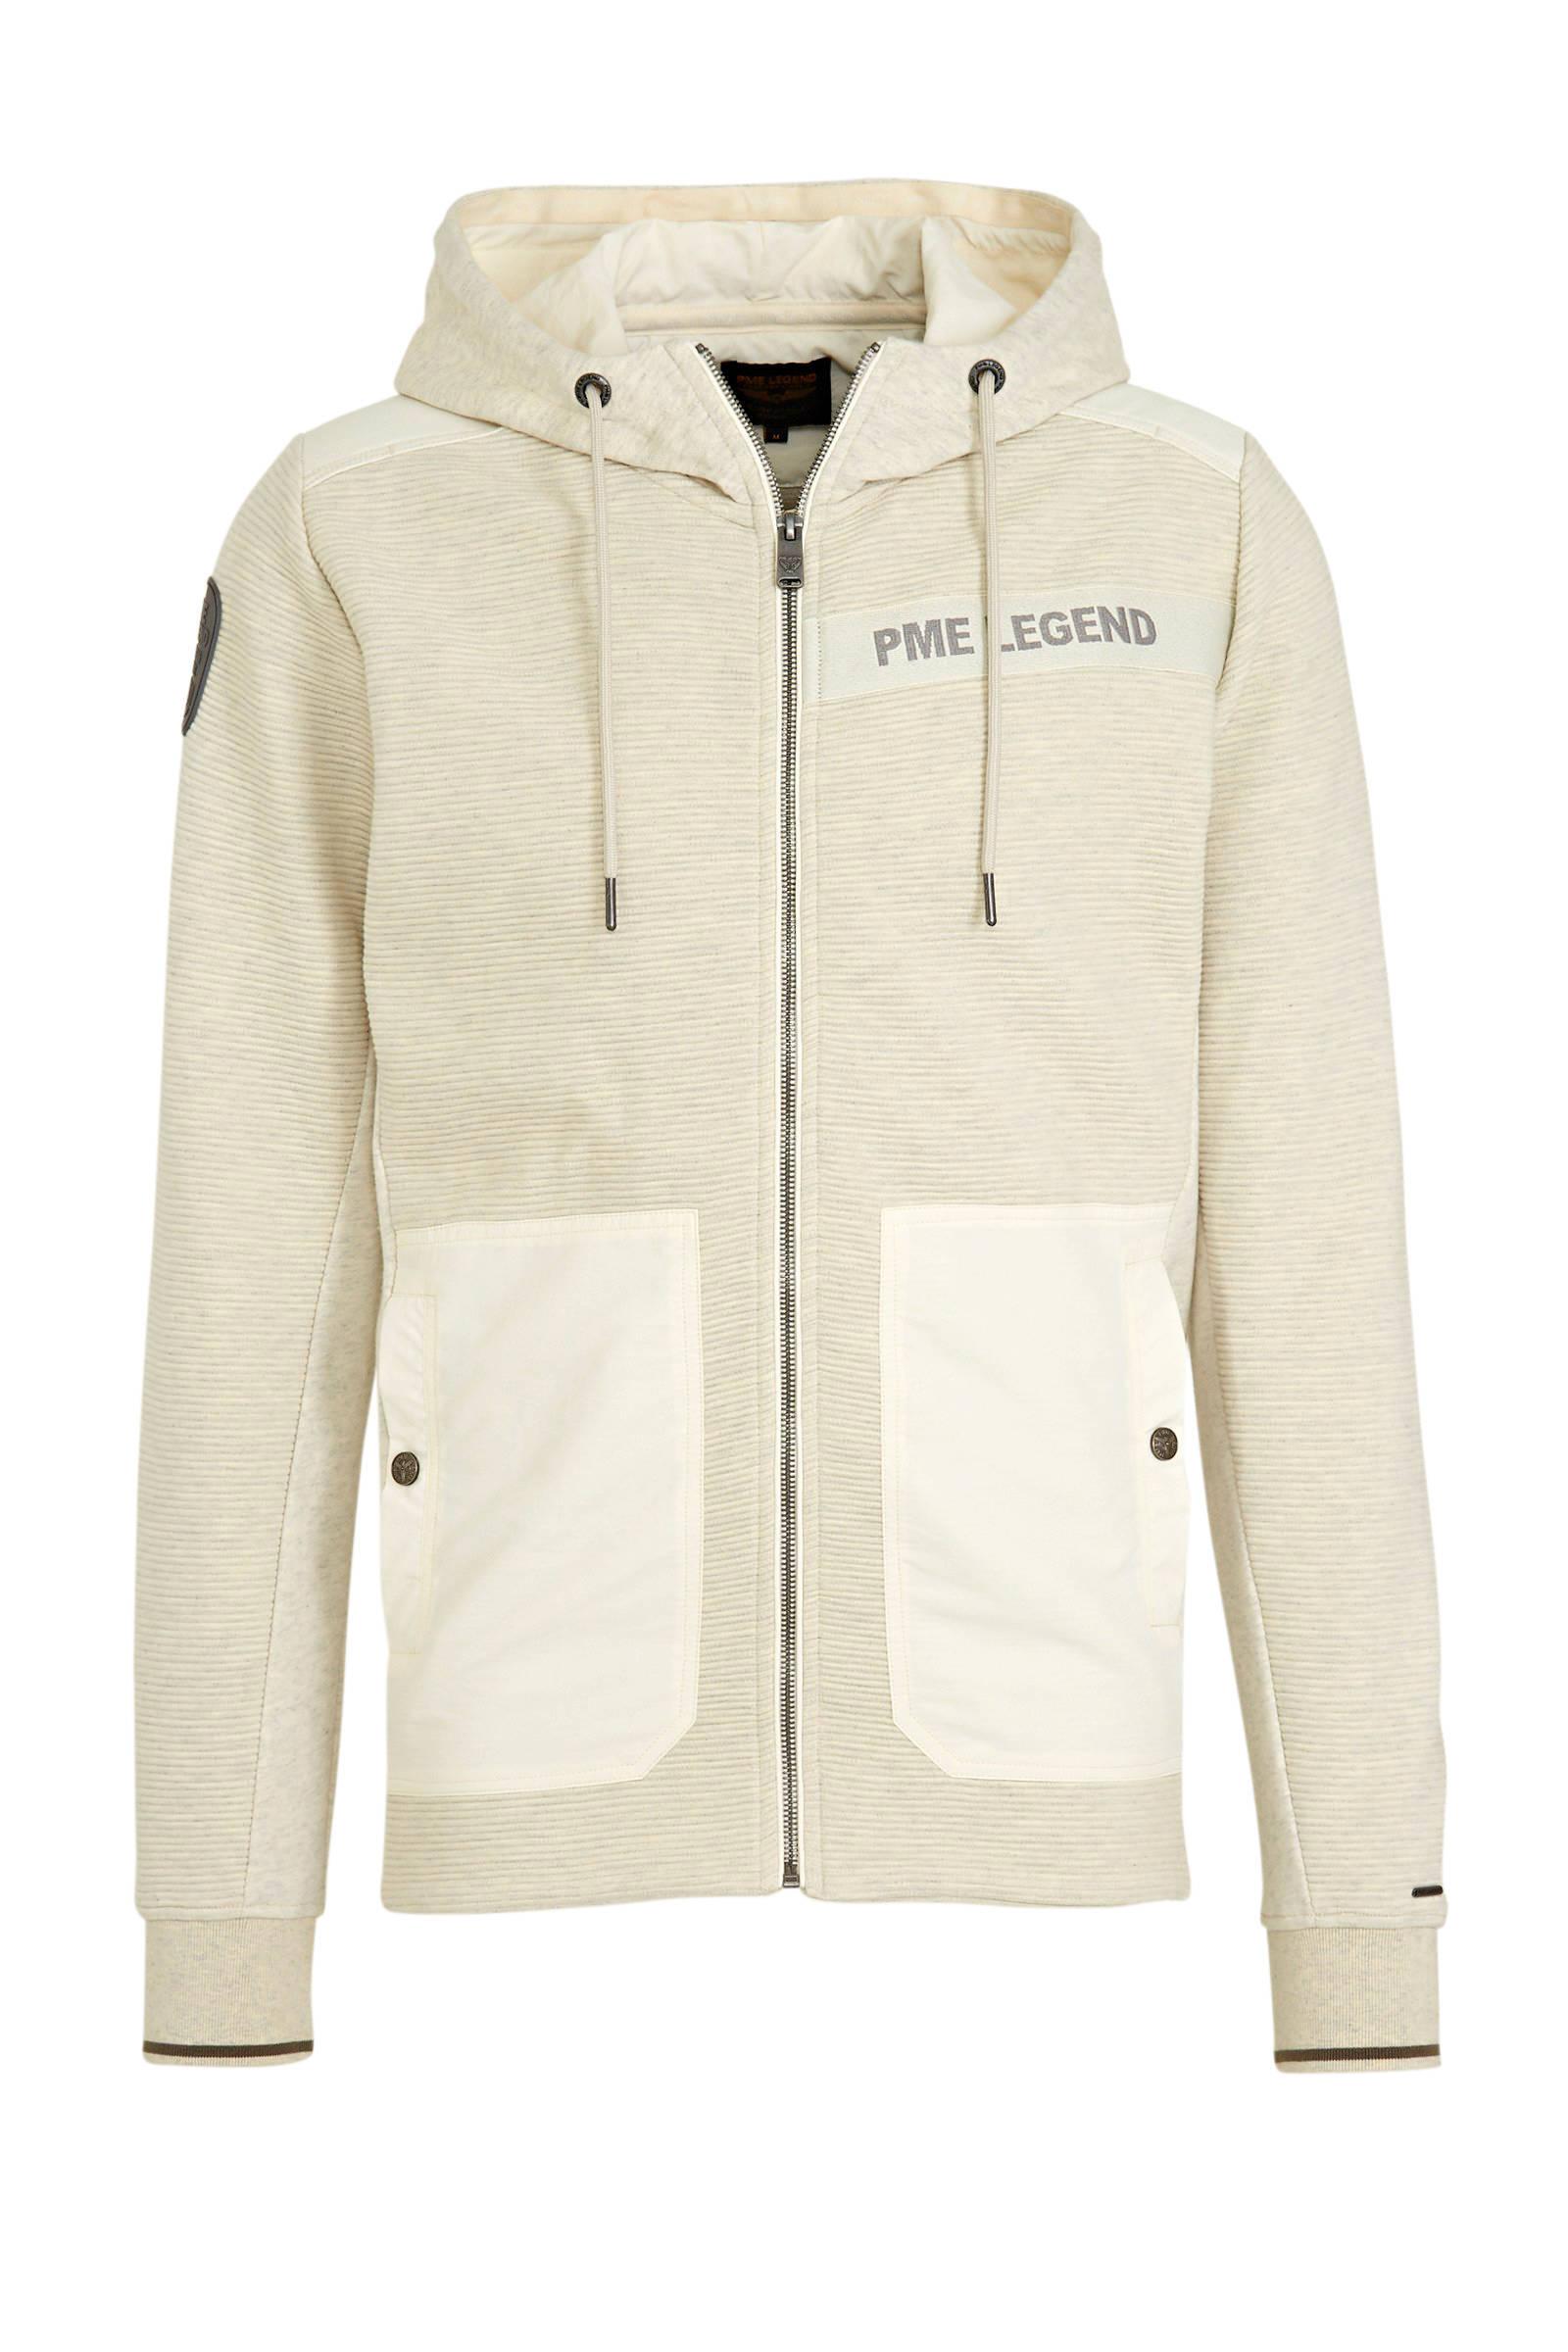 PME Legend Hooded jacket structure sweat online kopen